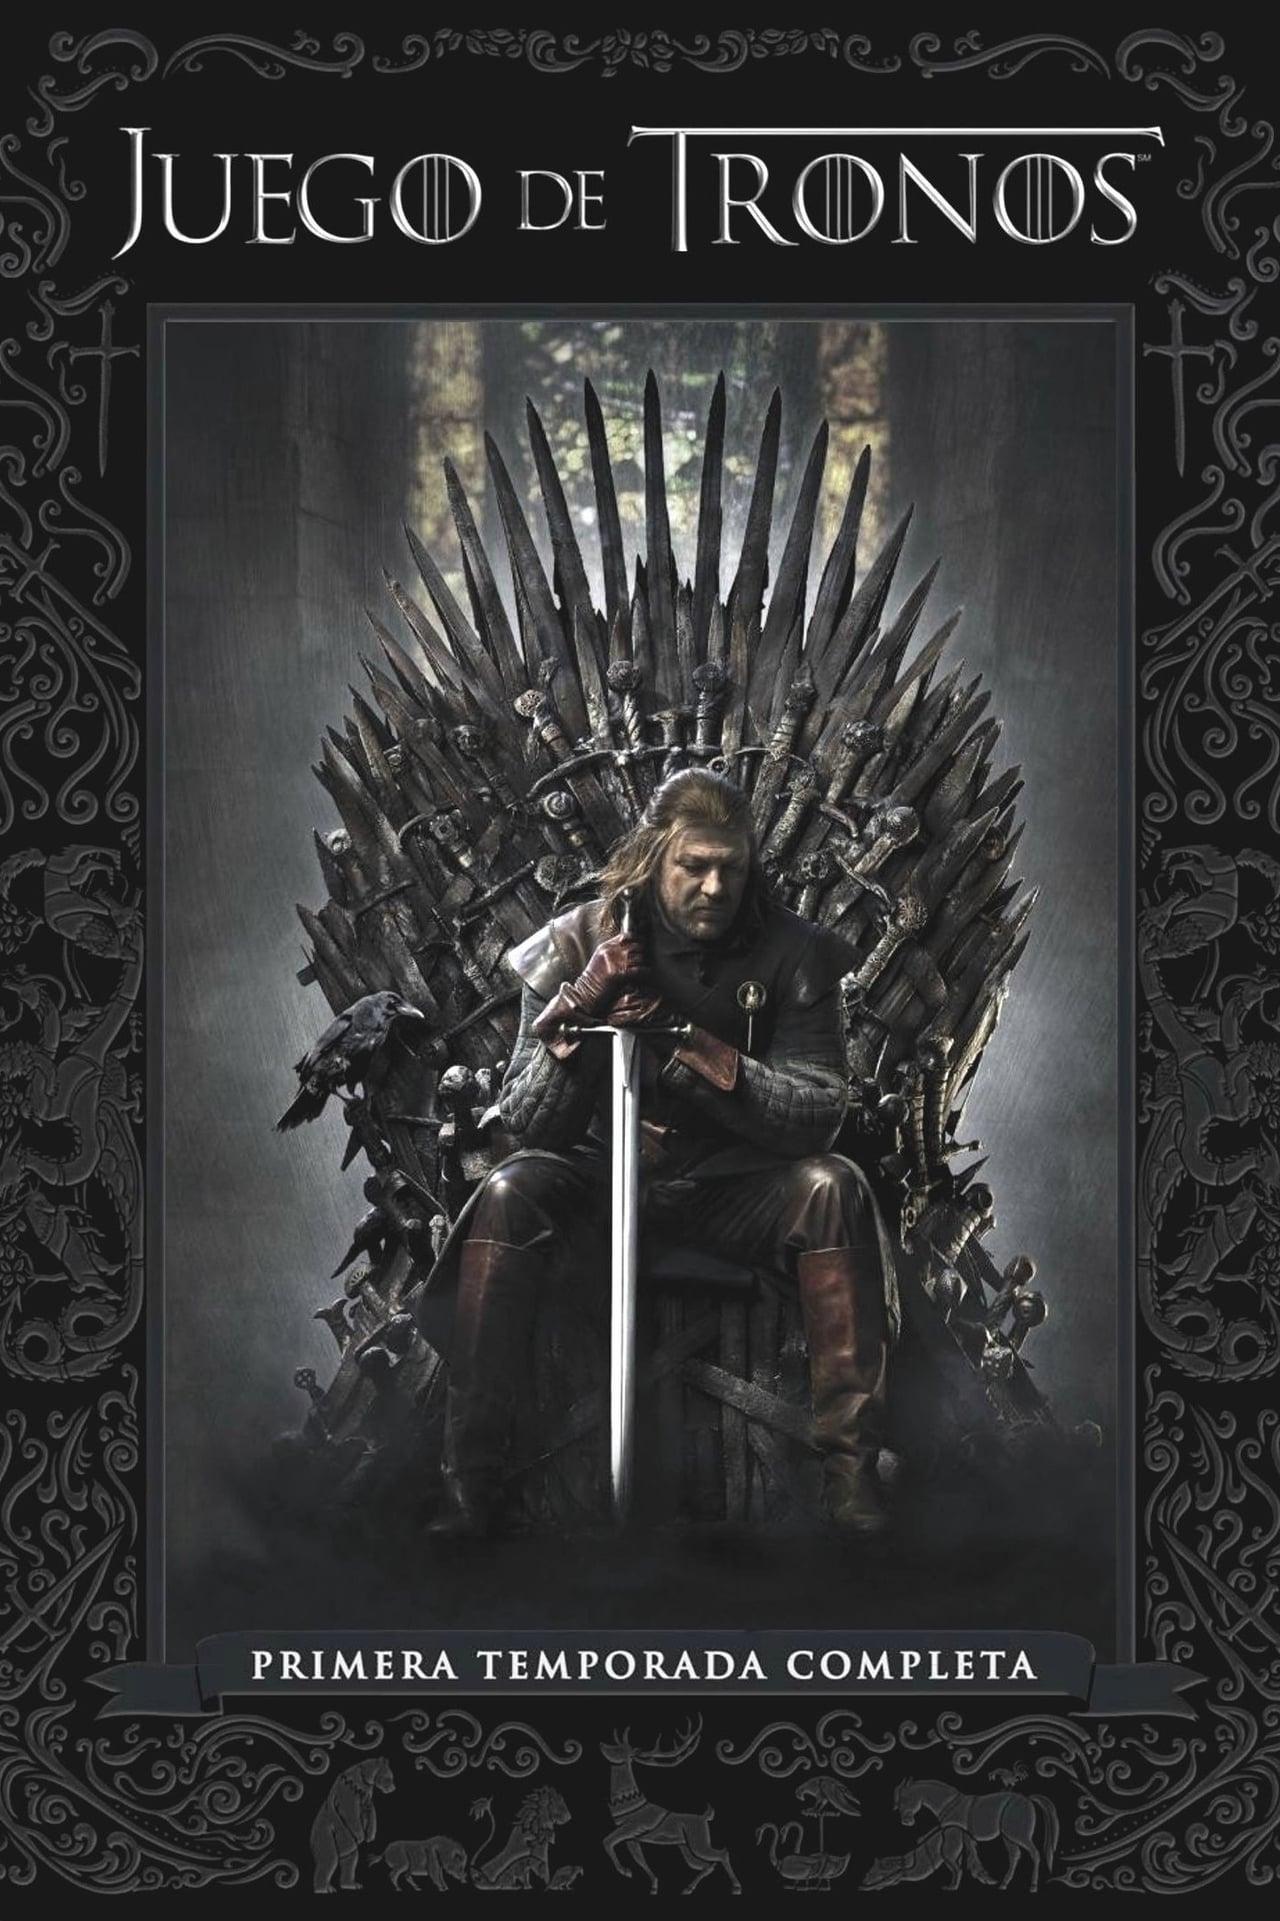 Juego de tronos - Temporada 2